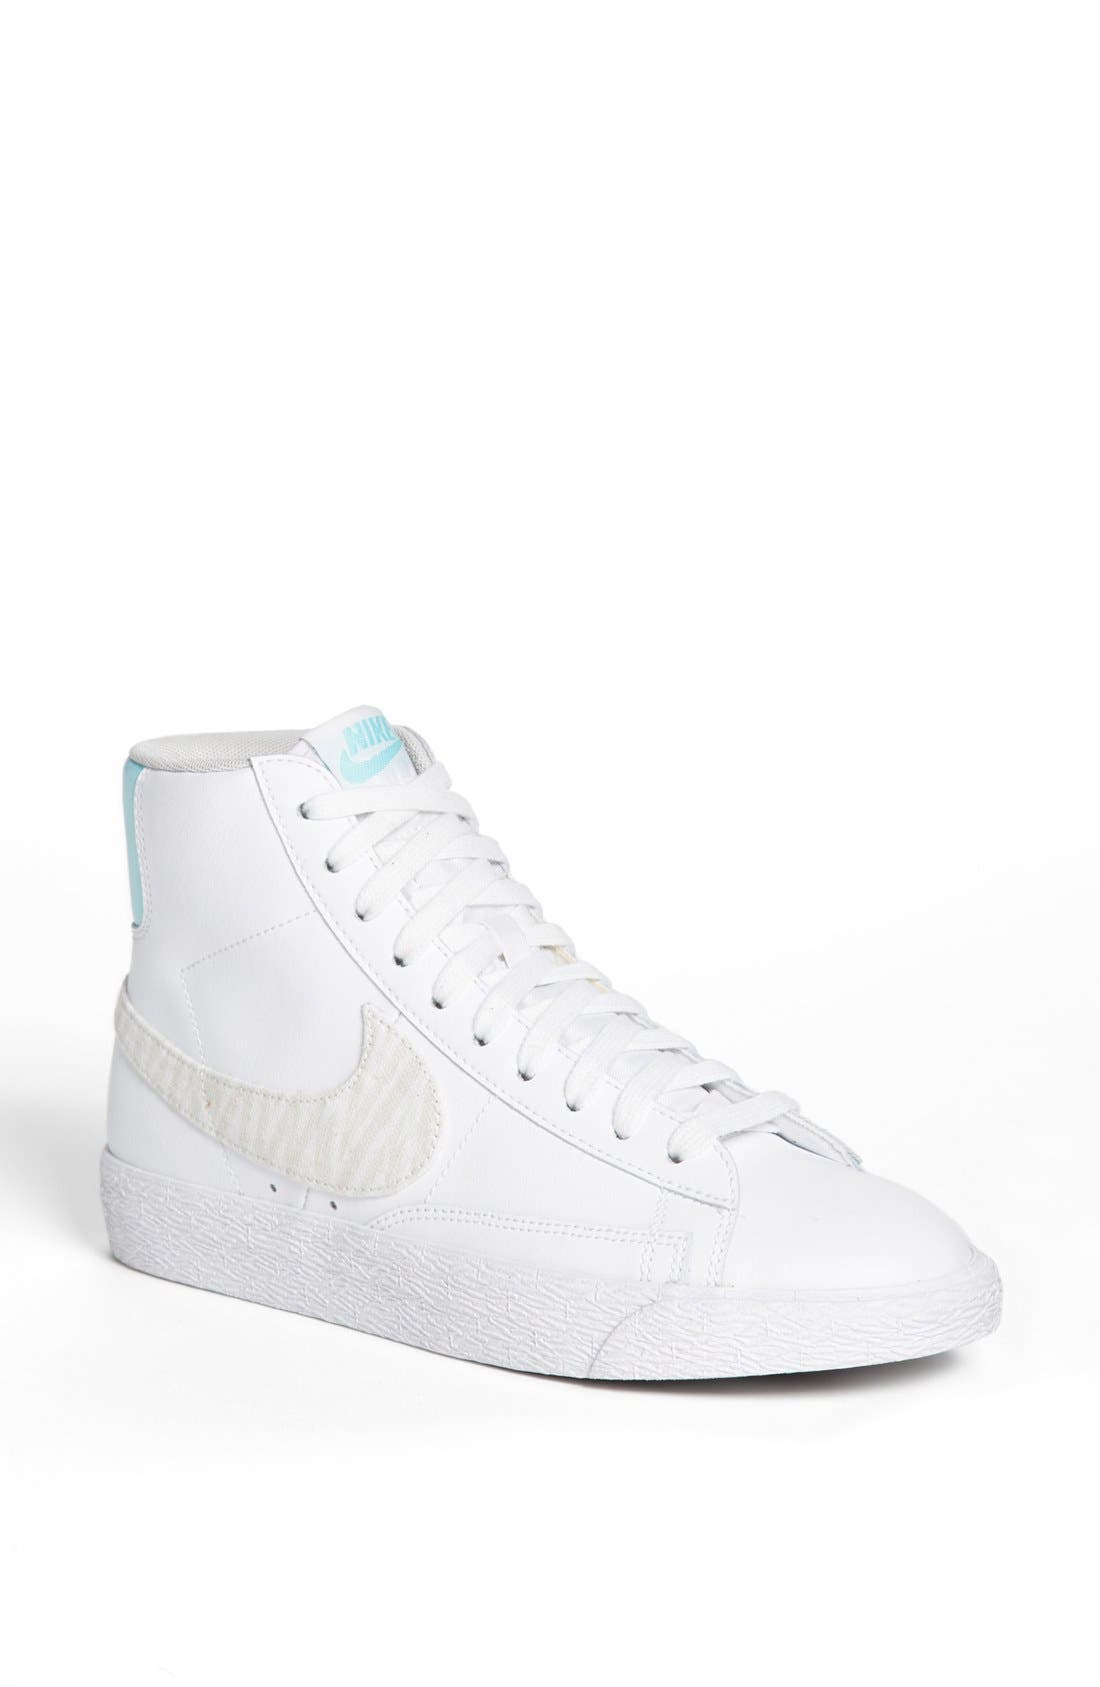 Alternate Image 1 Selected - Nike 'Blazer' Mid Leather Sneaker (Women)